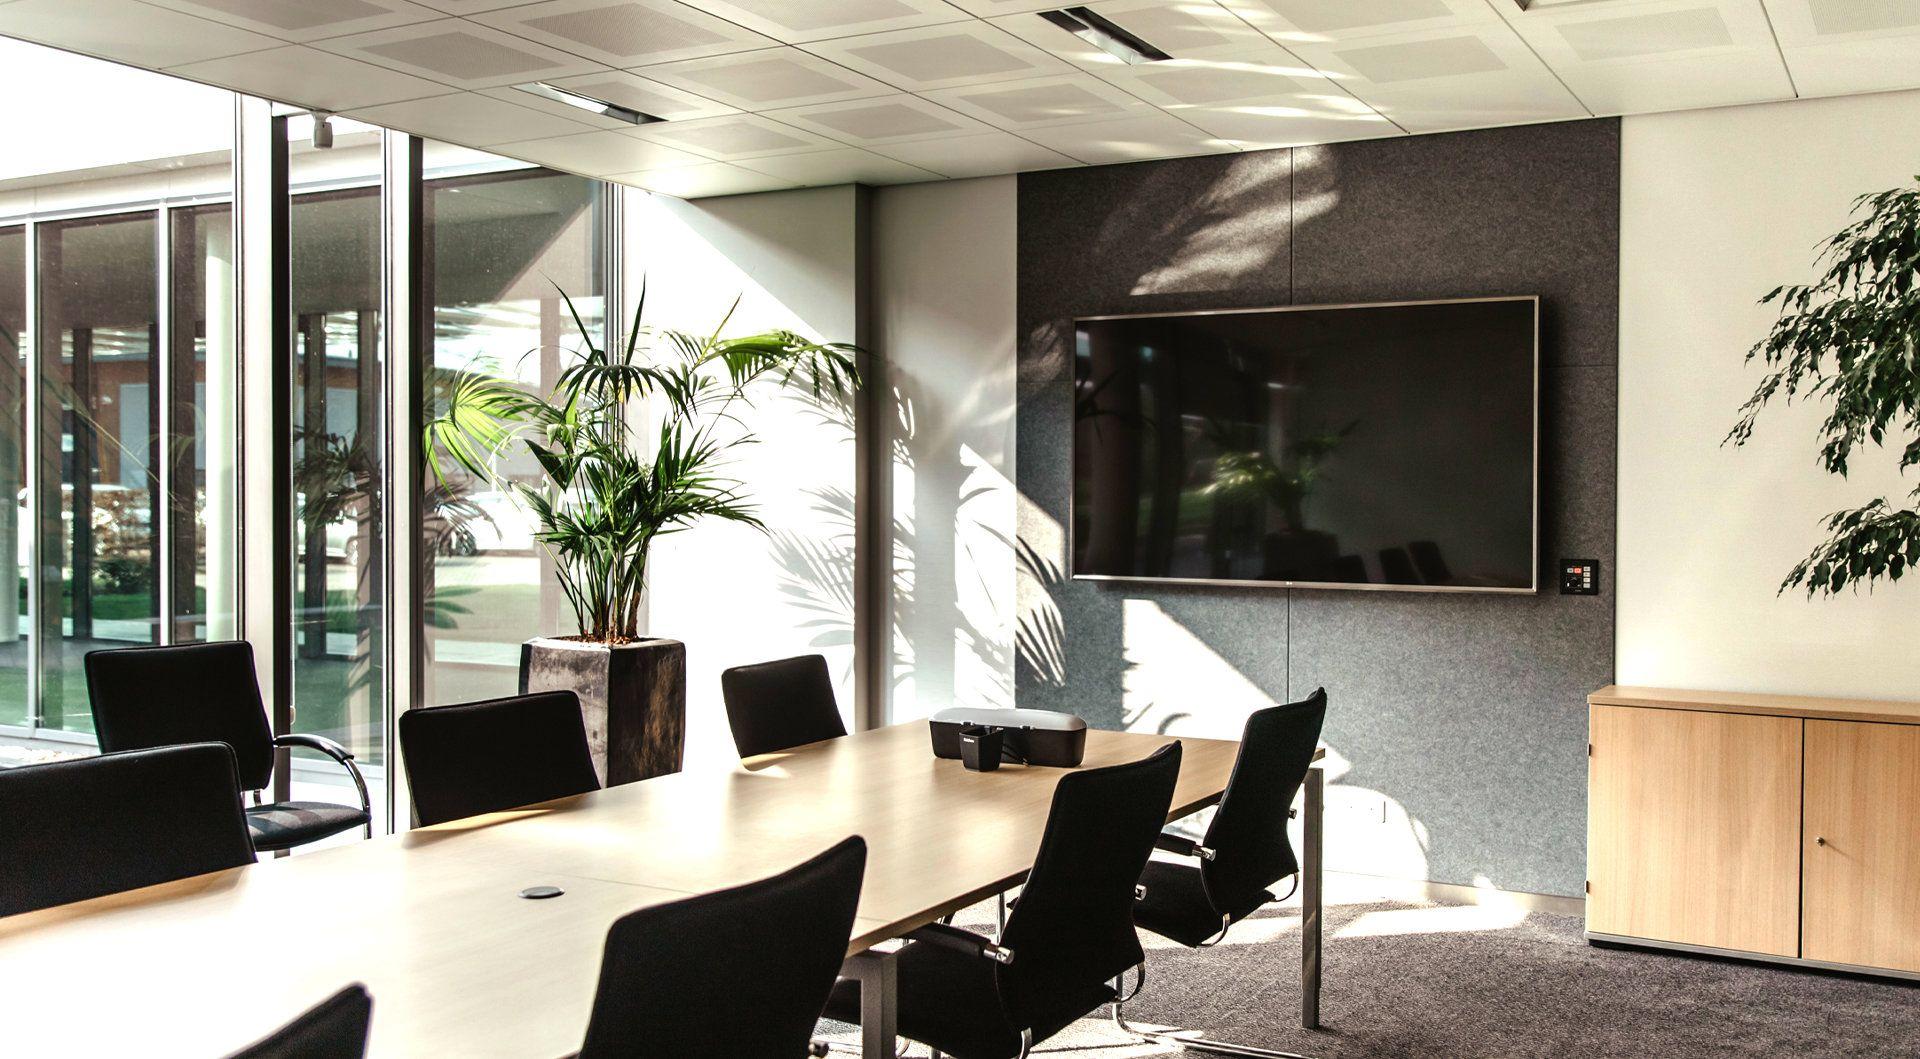 "LG 55SE3KE beeldkrant 139,7 cm (55"") LED Full HD Digitale signage flatscreen Zwart - Case studie de vries"